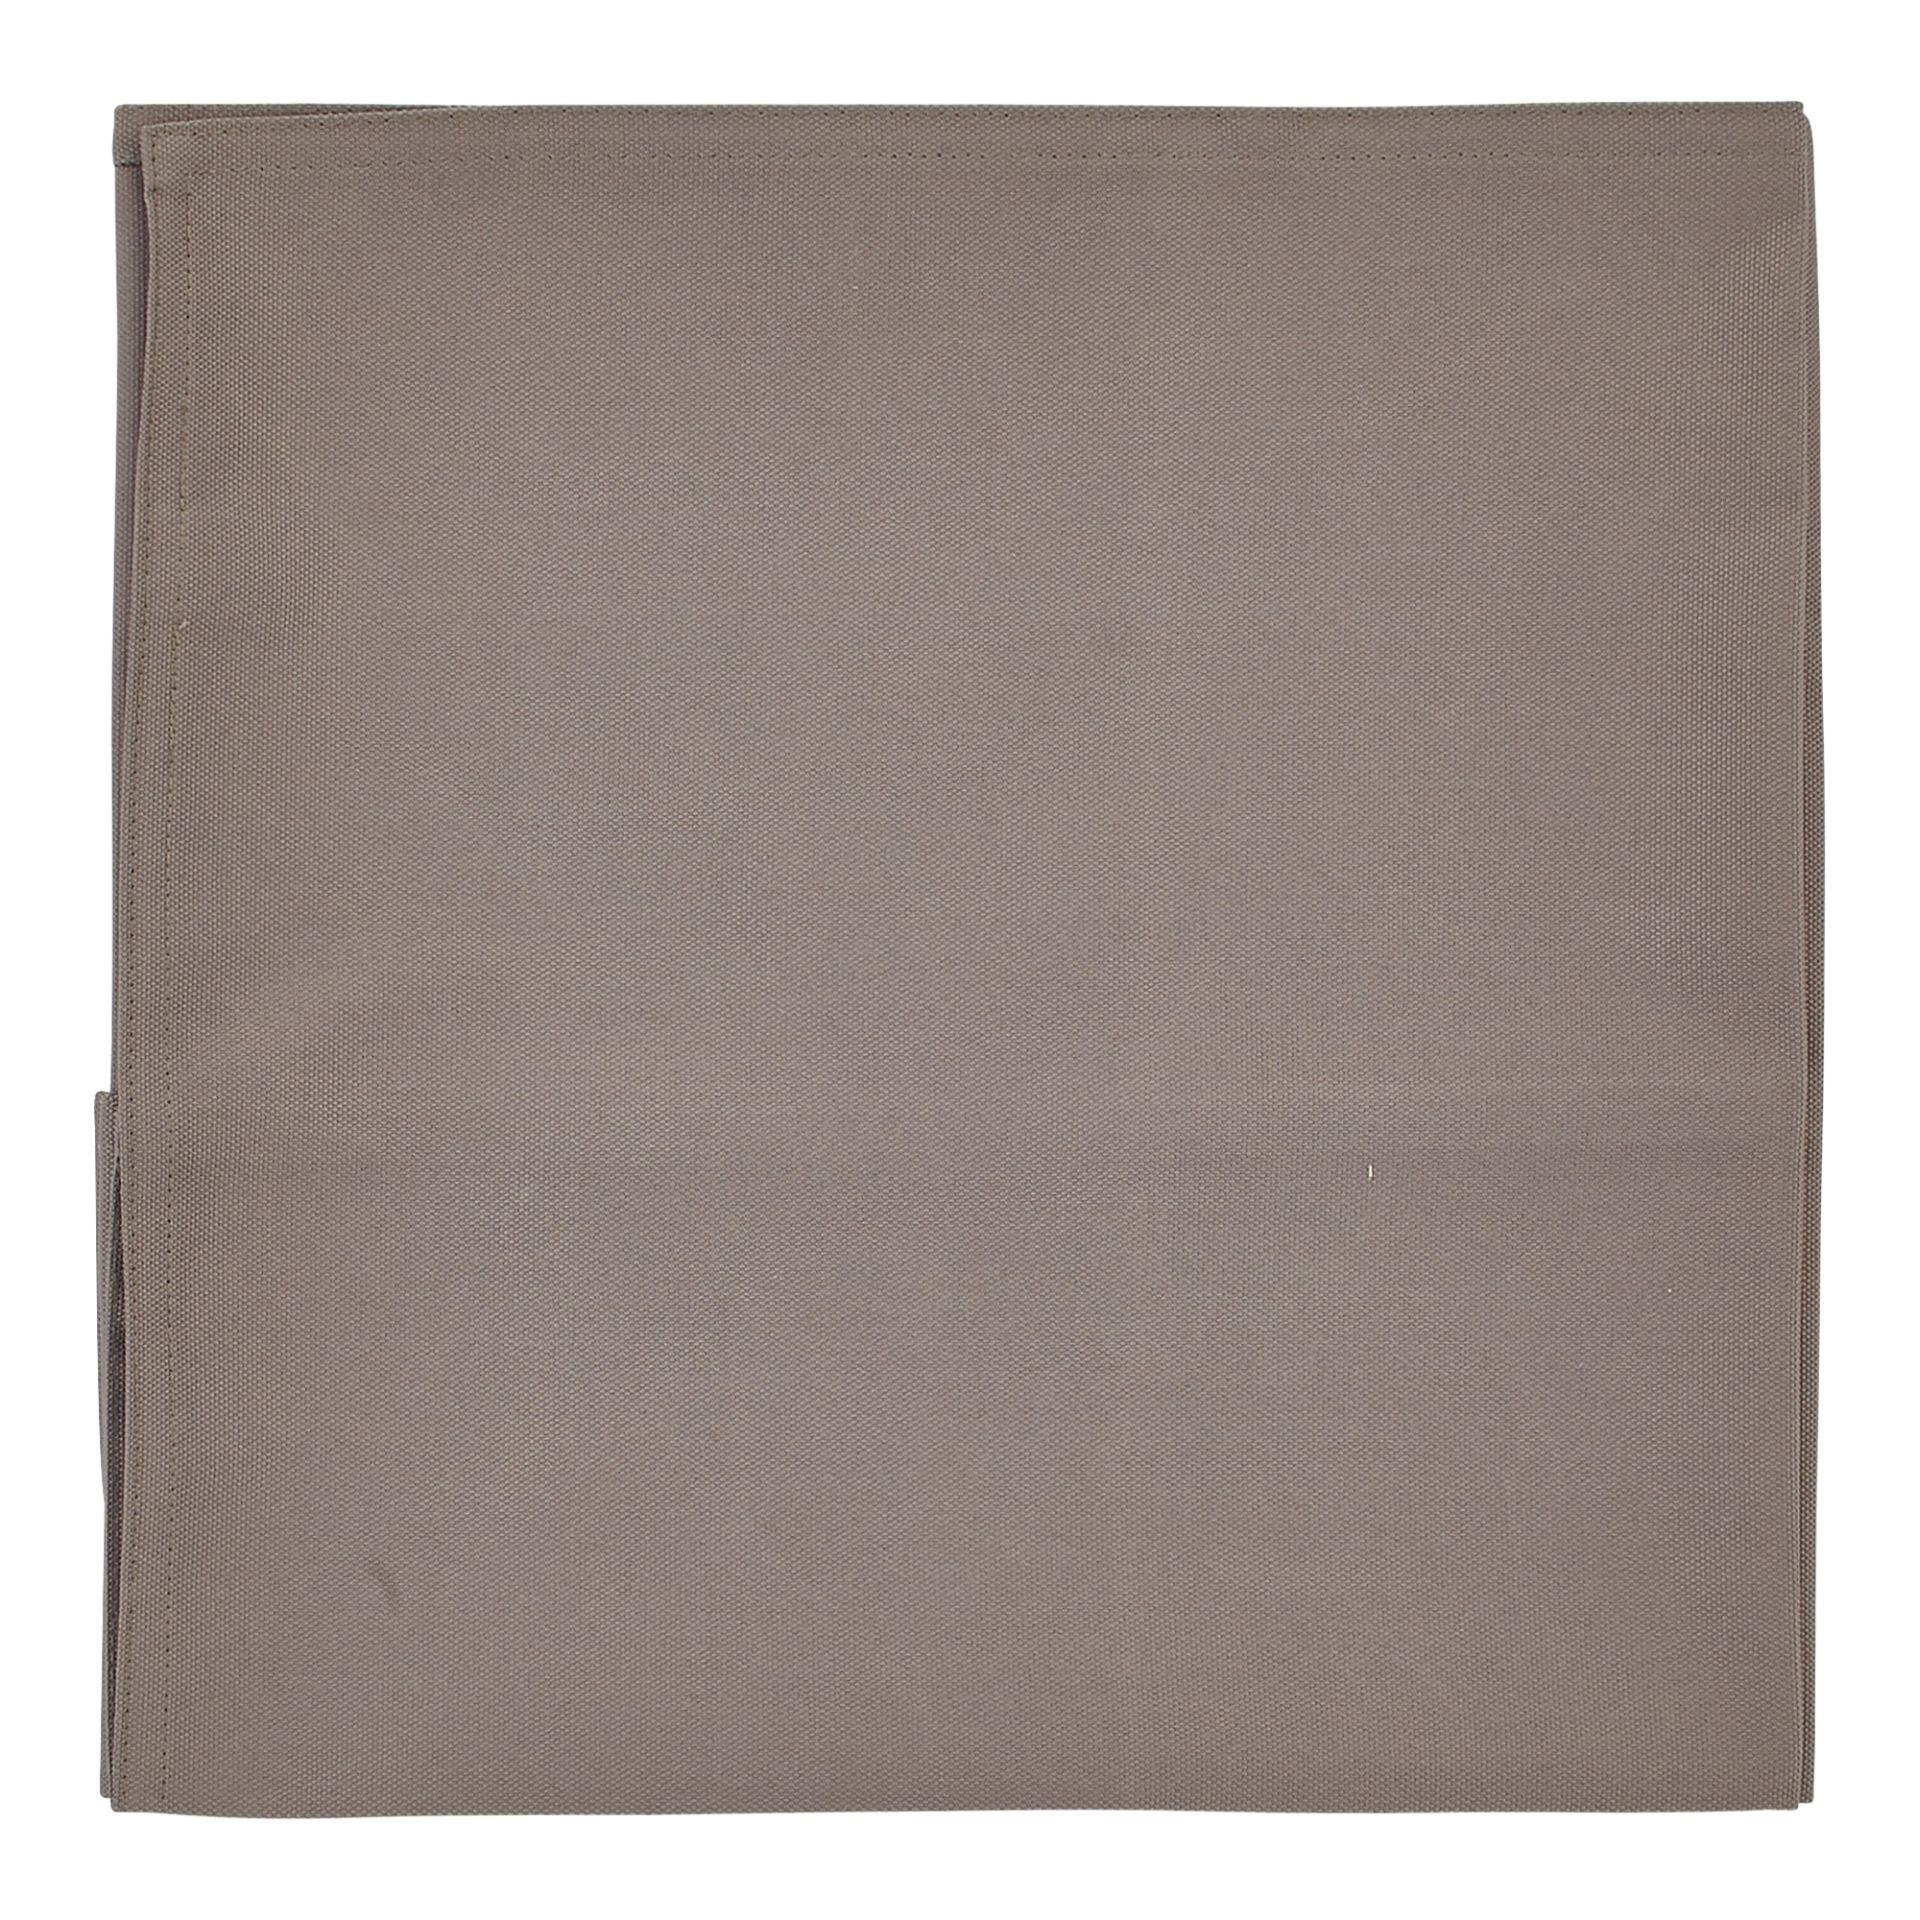 Tafelloper Sunny  45x150 cm taupe Outdoor collectie